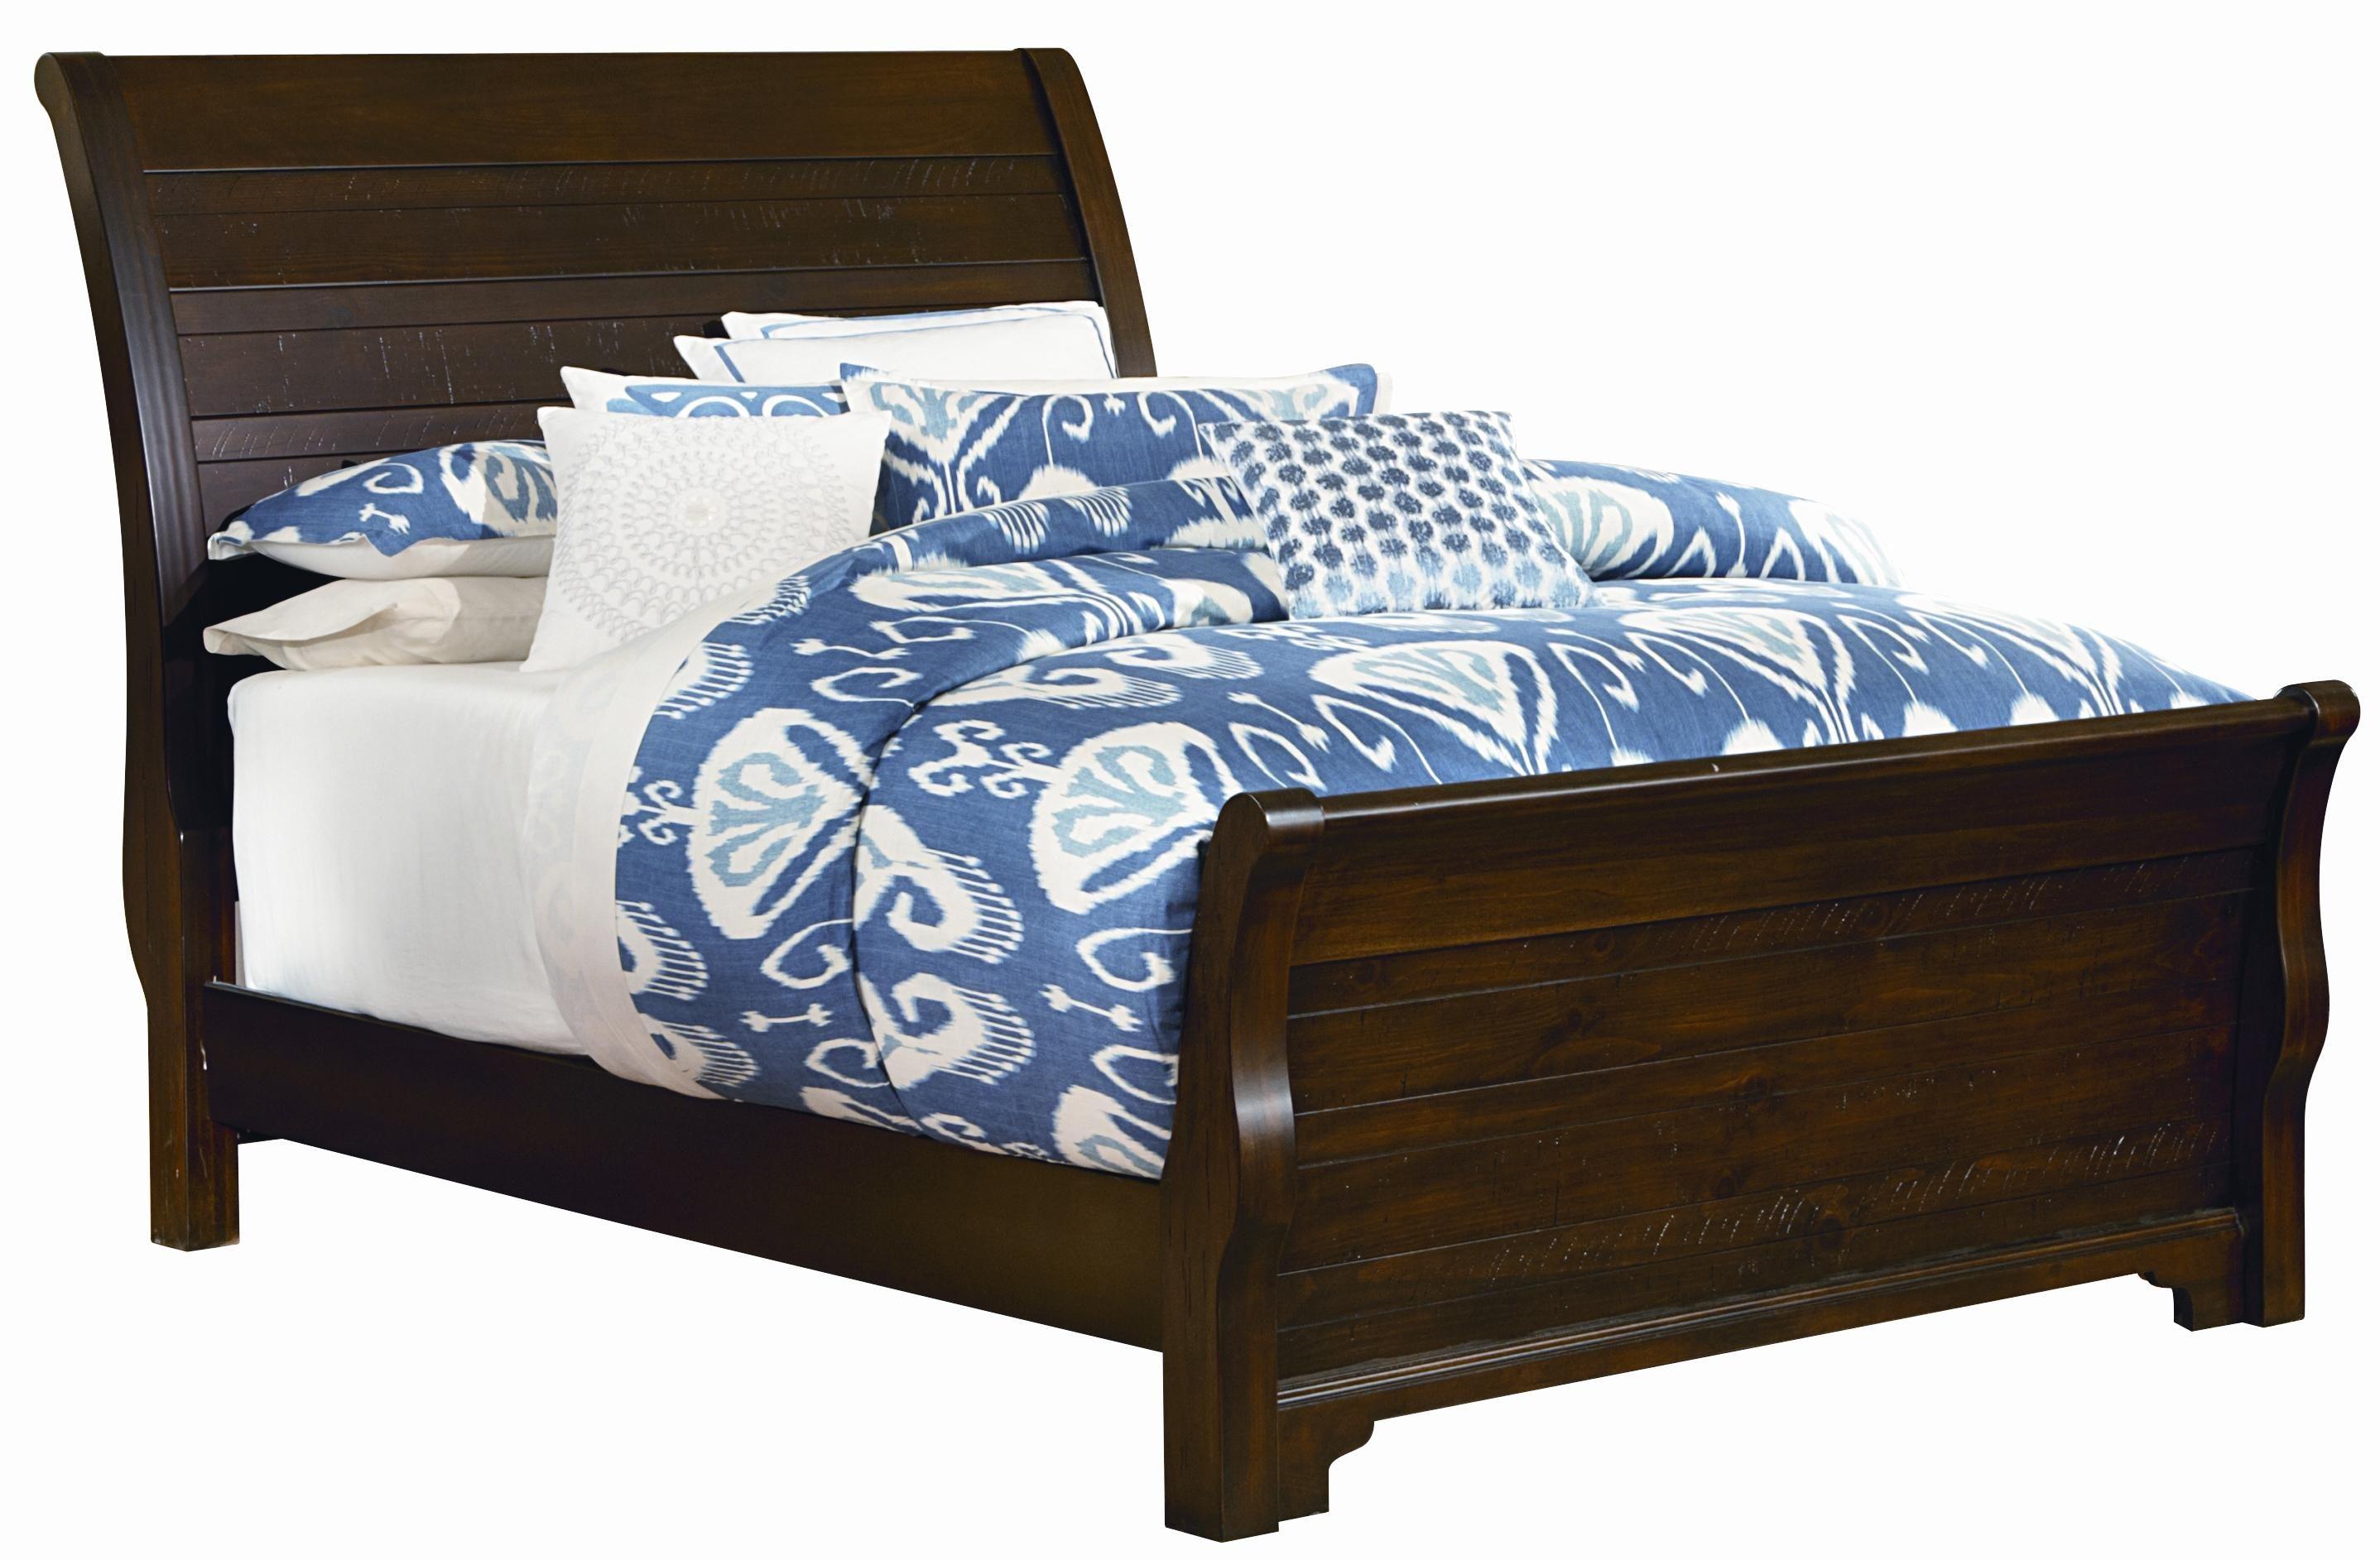 Hanover King Sleigh Bed By Vaughan Bassett Dormitorios Muebles